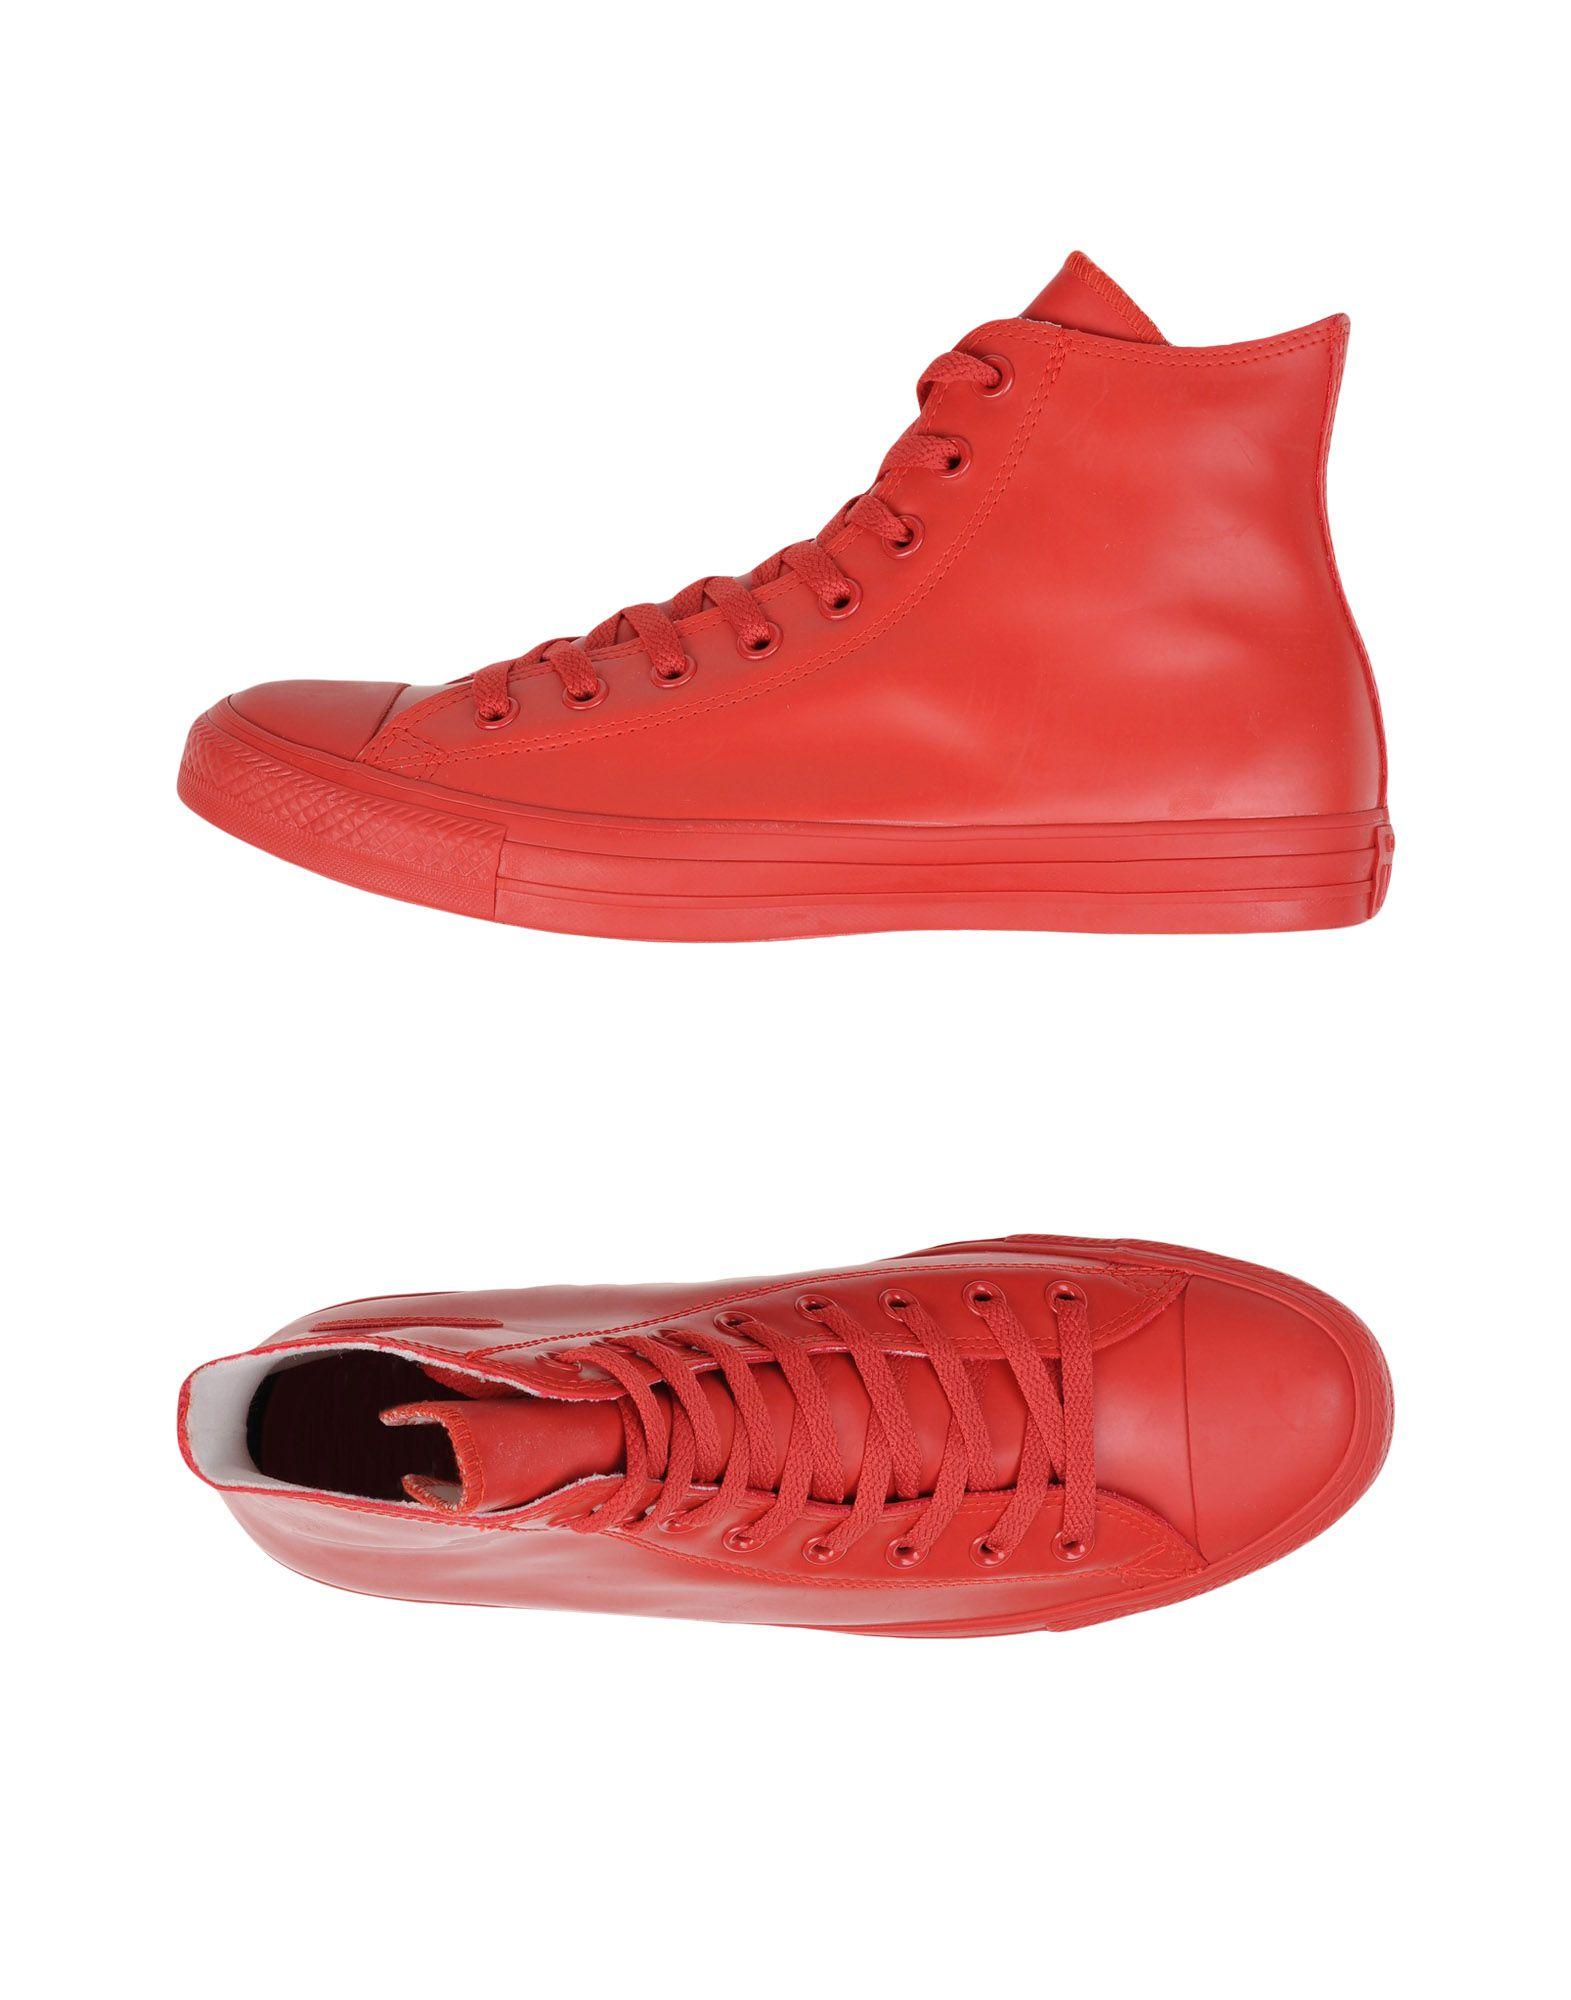 Converse All Star All Star Hi Rubber  11114120GK 11114120GK  Heiße Schuhe 8c1d1c